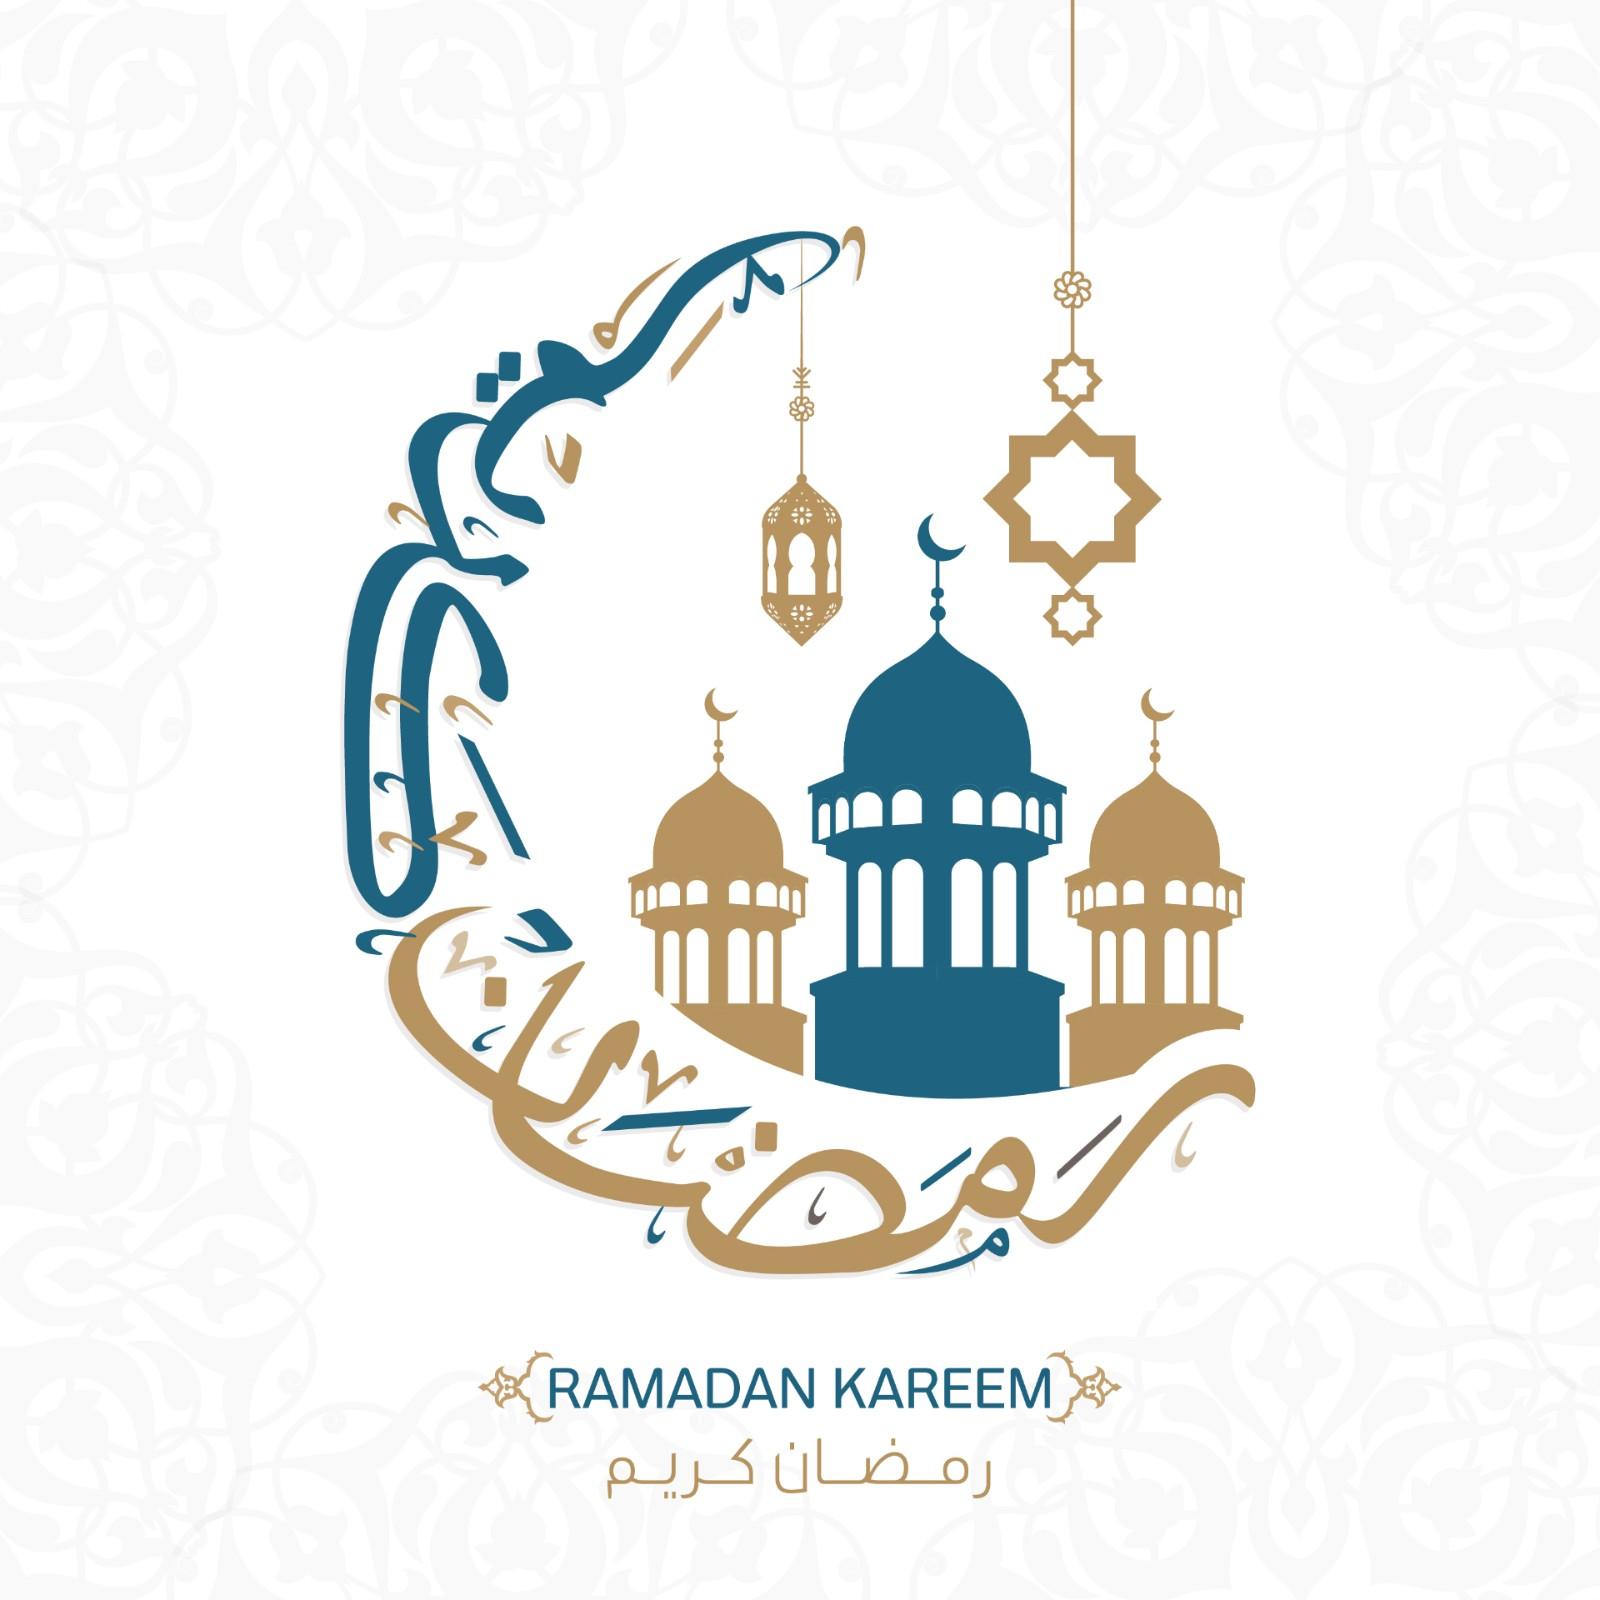 رمضان كريم كل عام وأنتم بخير انتربرايز